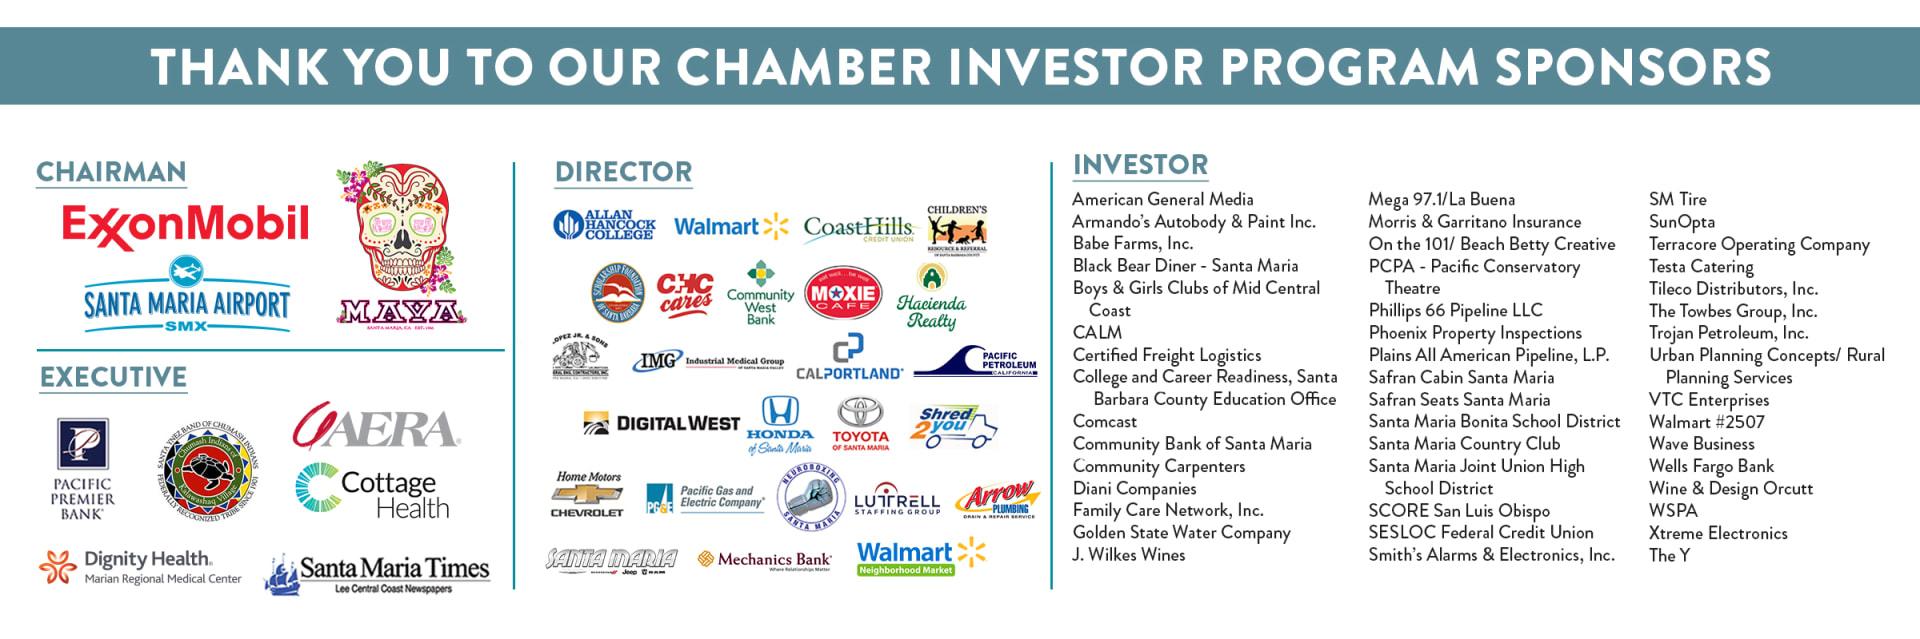 Sponsors-web-slide-6-24-w1920.jpg